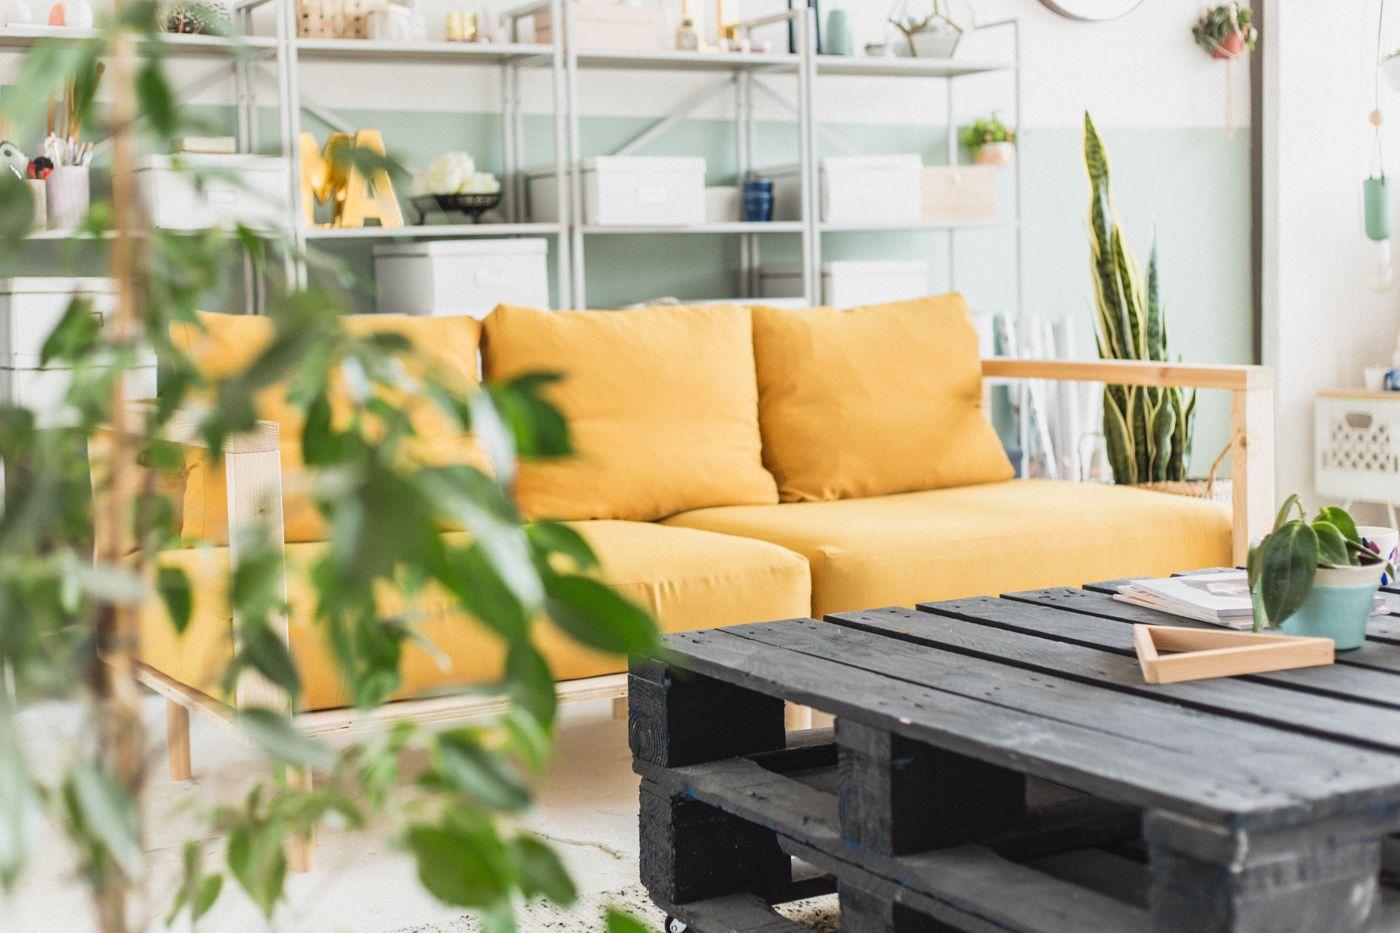 Make Yourself Comfortable With This Easy Diy Wooden Studio Sofa Fall For Diy Garden Sofa Diy Diy Furniture Couch Diy Sofa